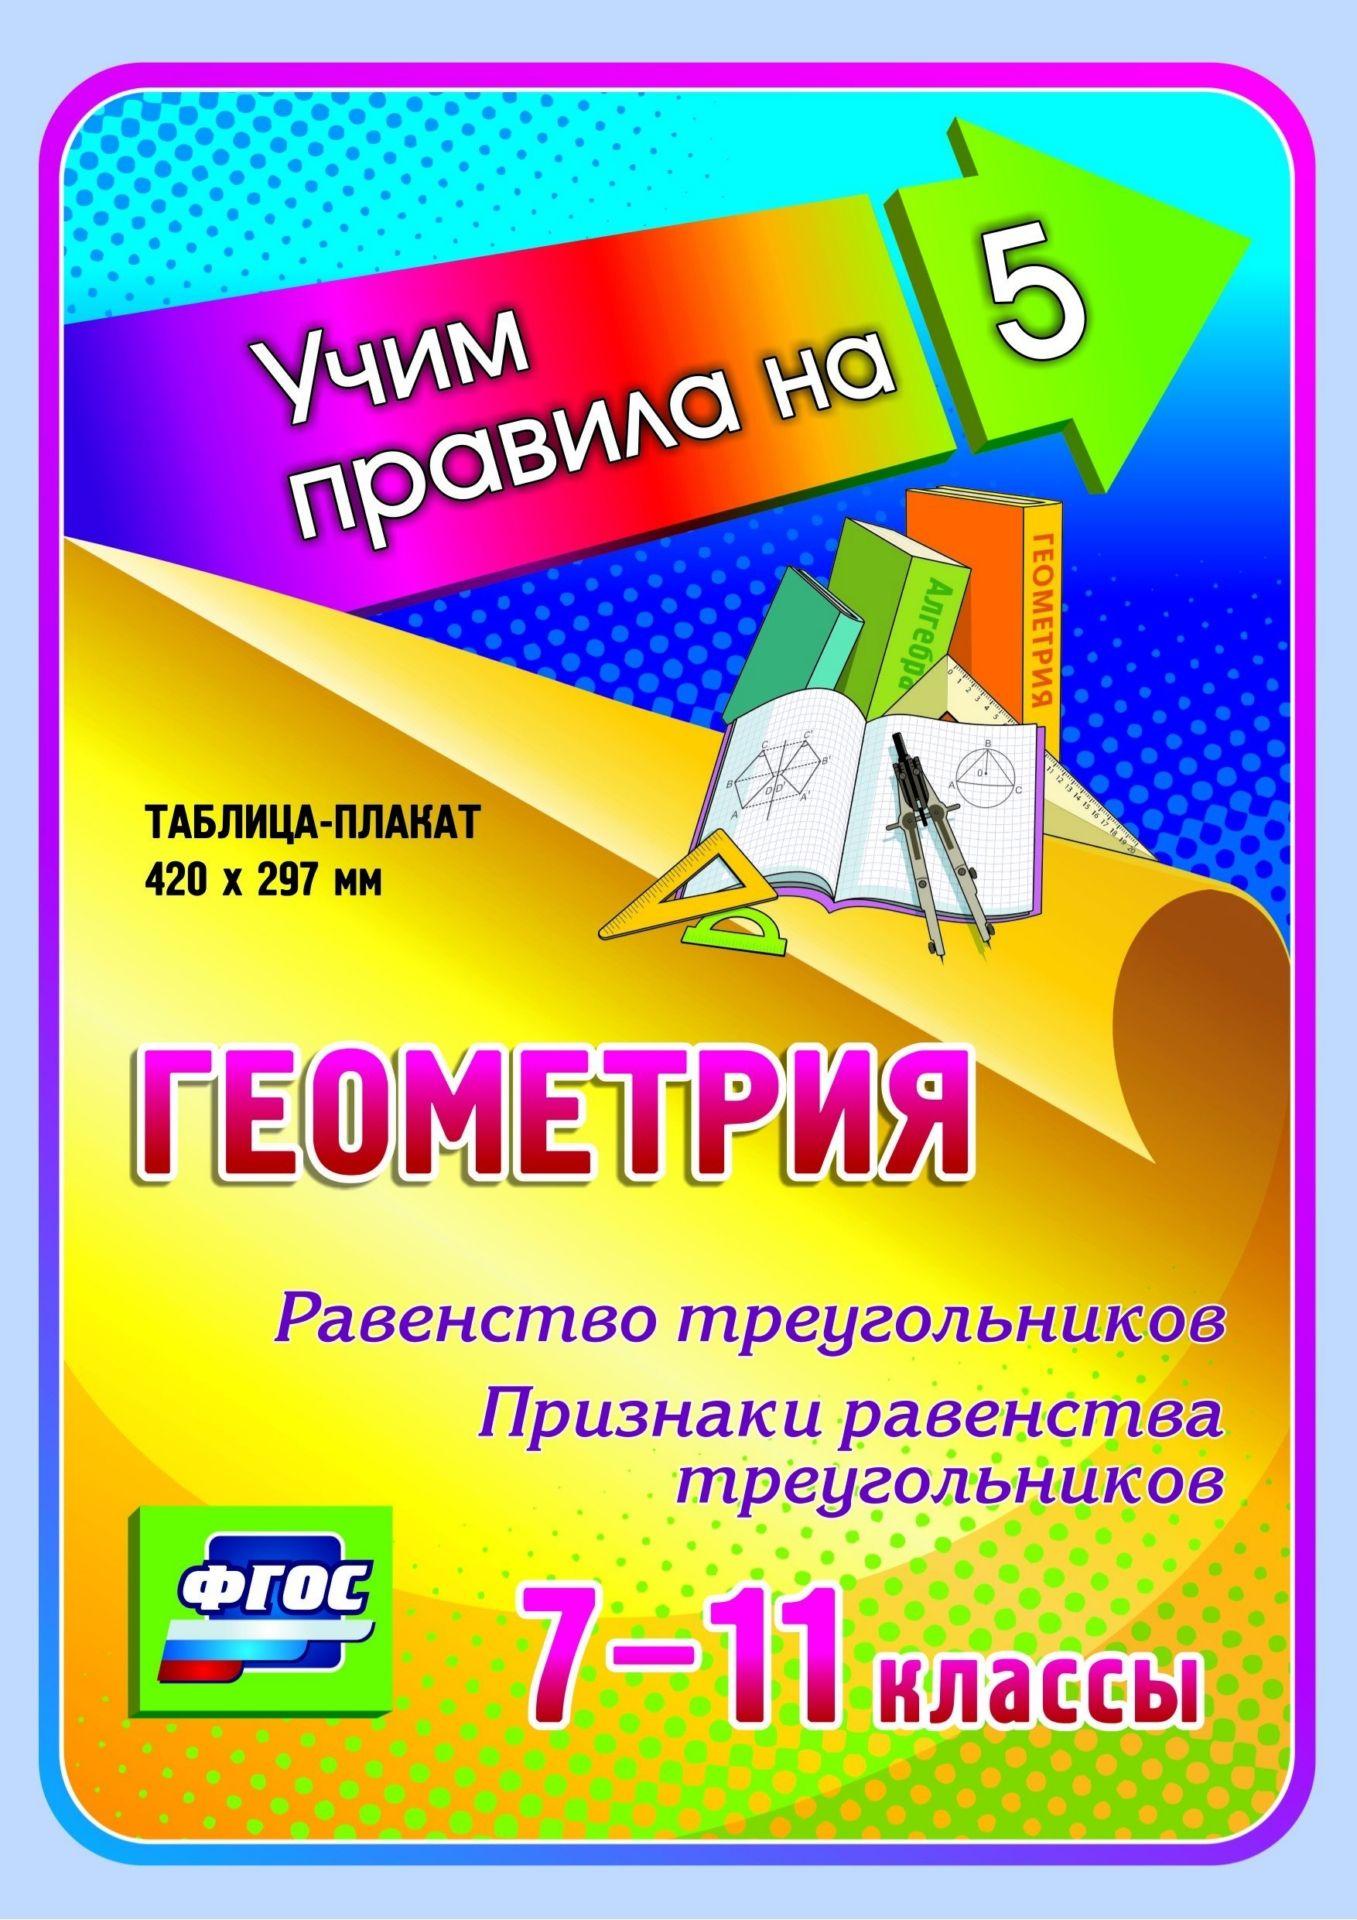 Геометрия. Равенство треугольников. Признаки равенства треугольников. 7-11 классы: Таблица-плакат 420х297